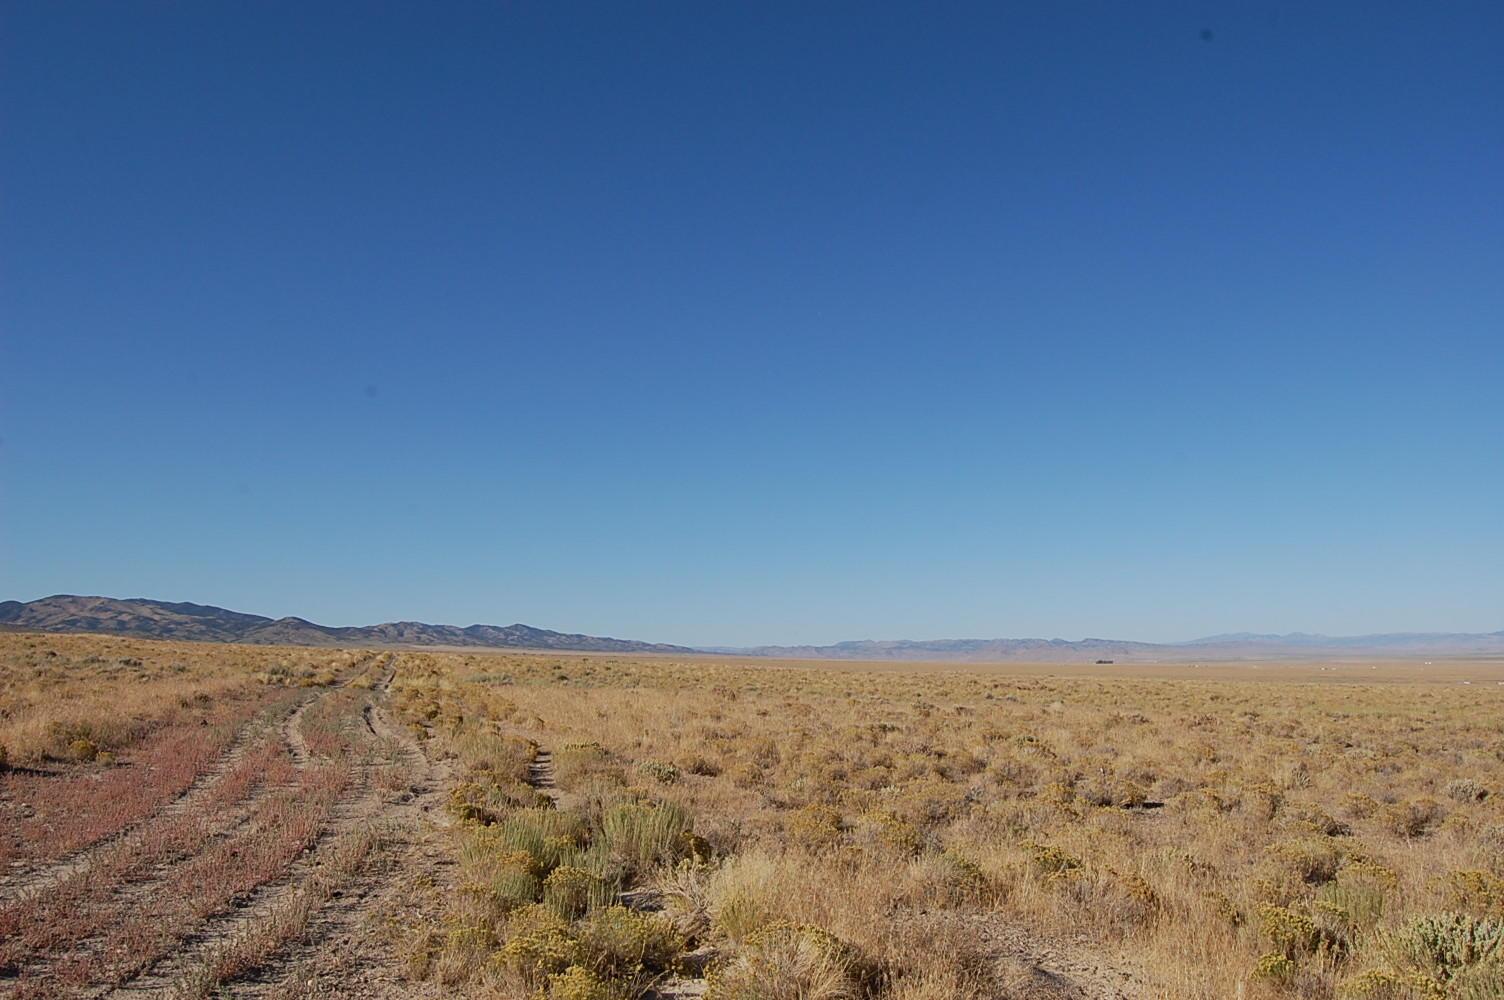 Escape into the Nevada Mountain Range on Stunning 2 Acres - Image 2